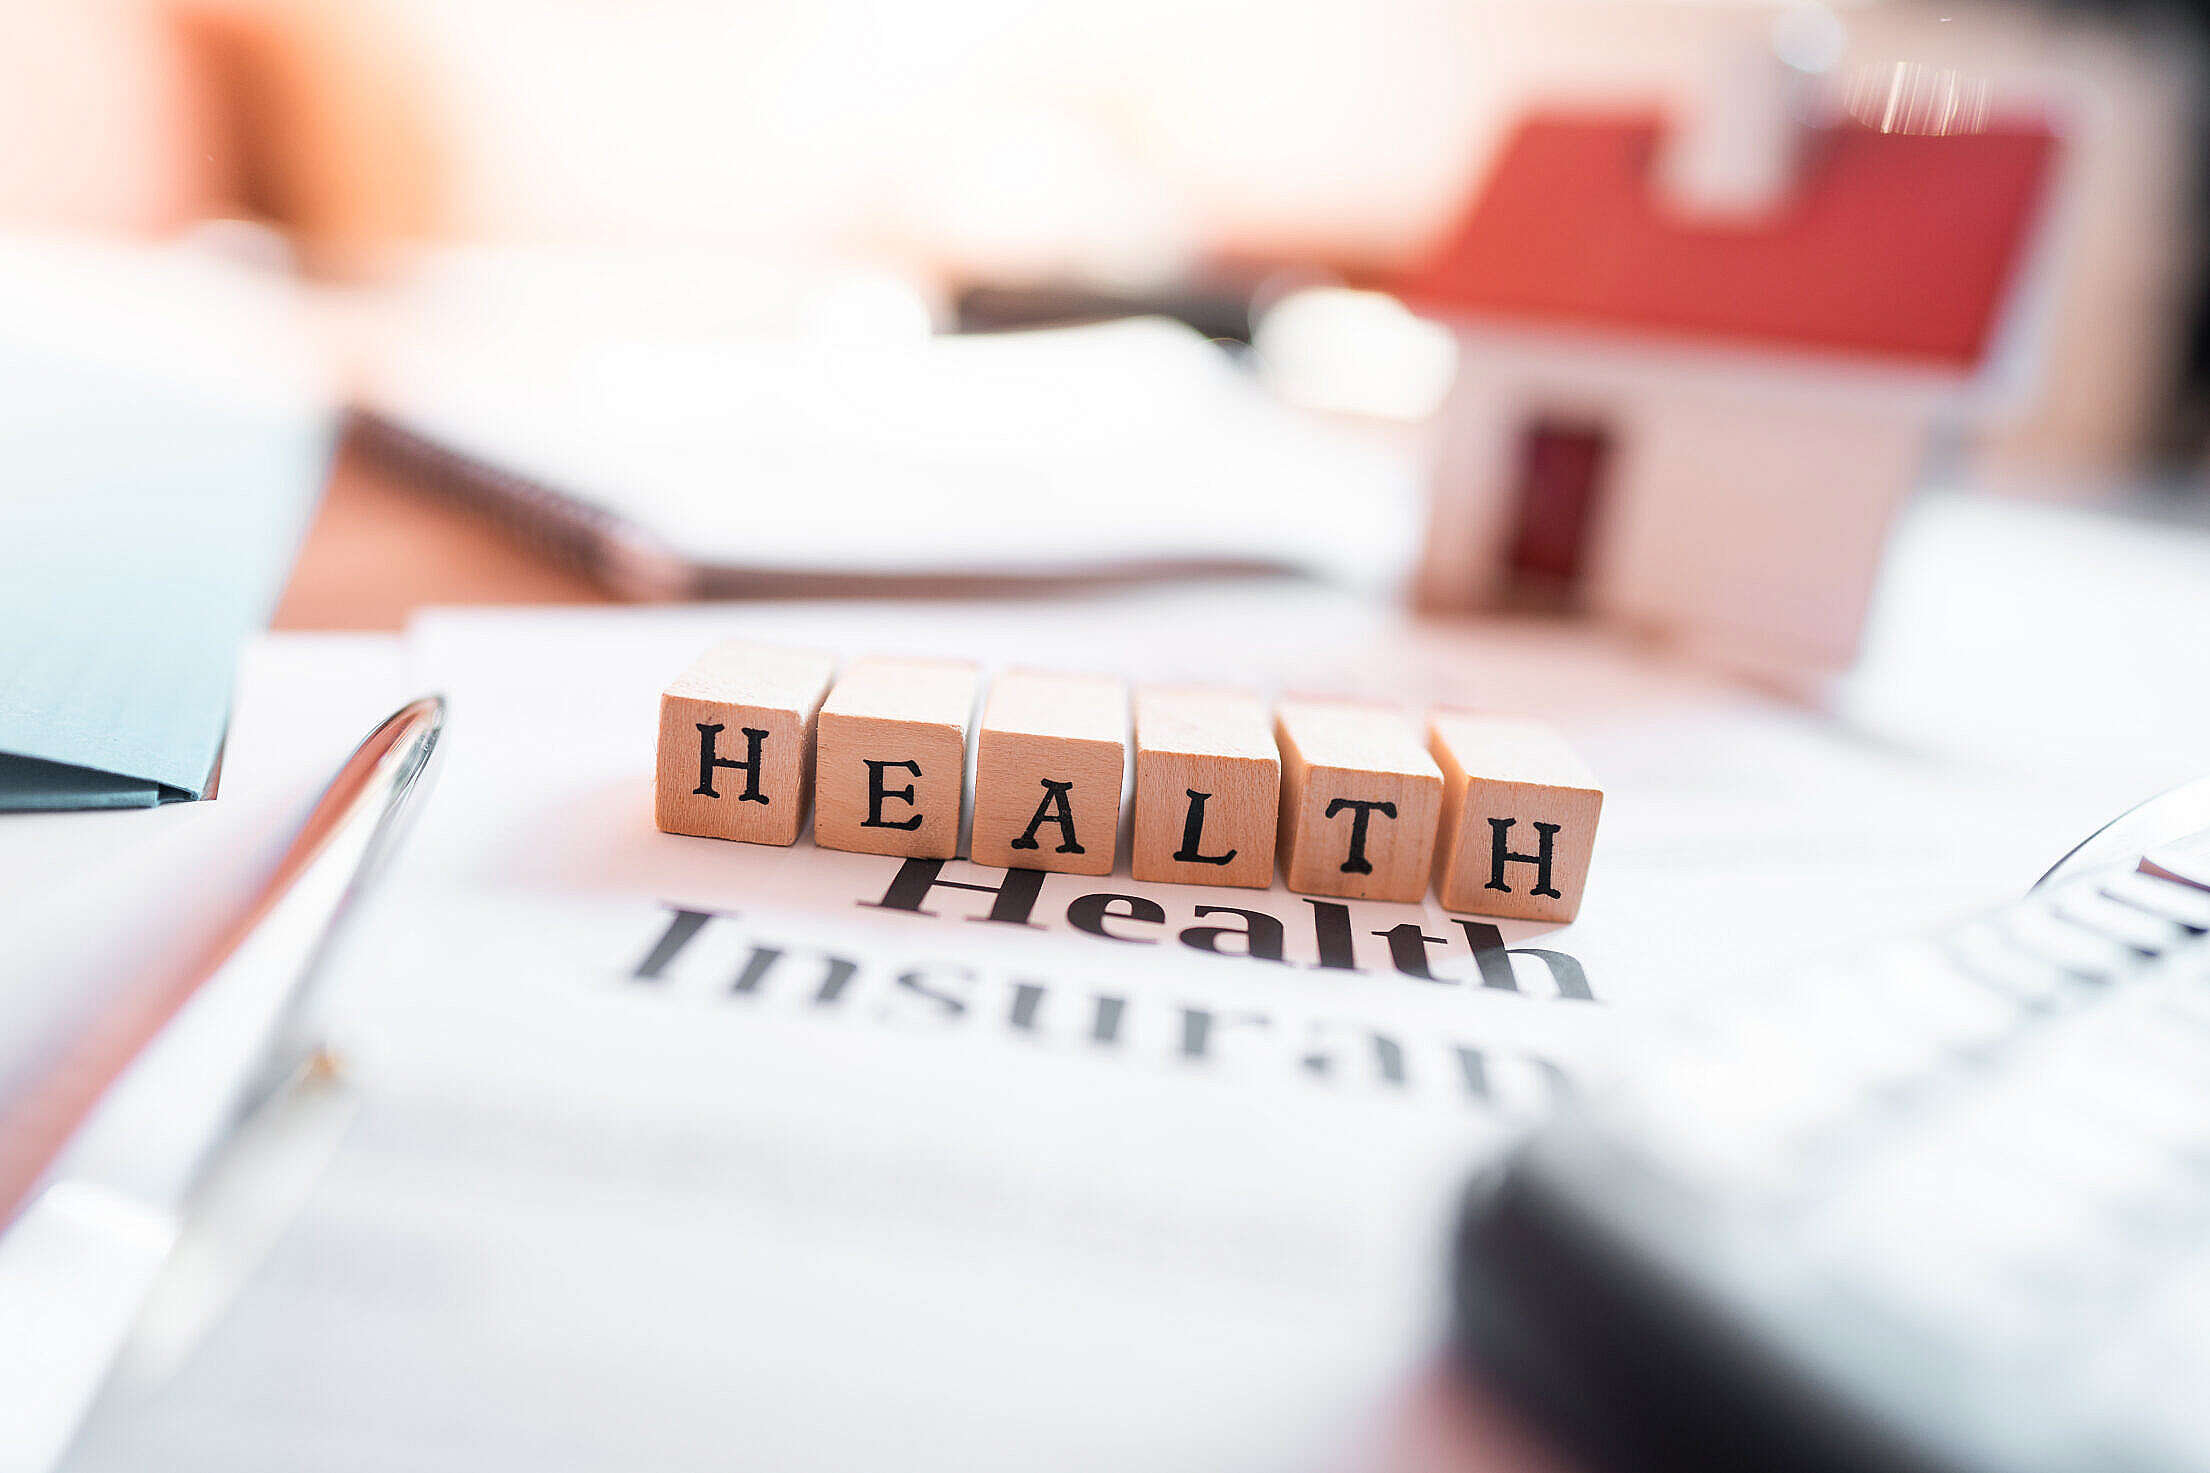 Health Insurance Free Stock Photo